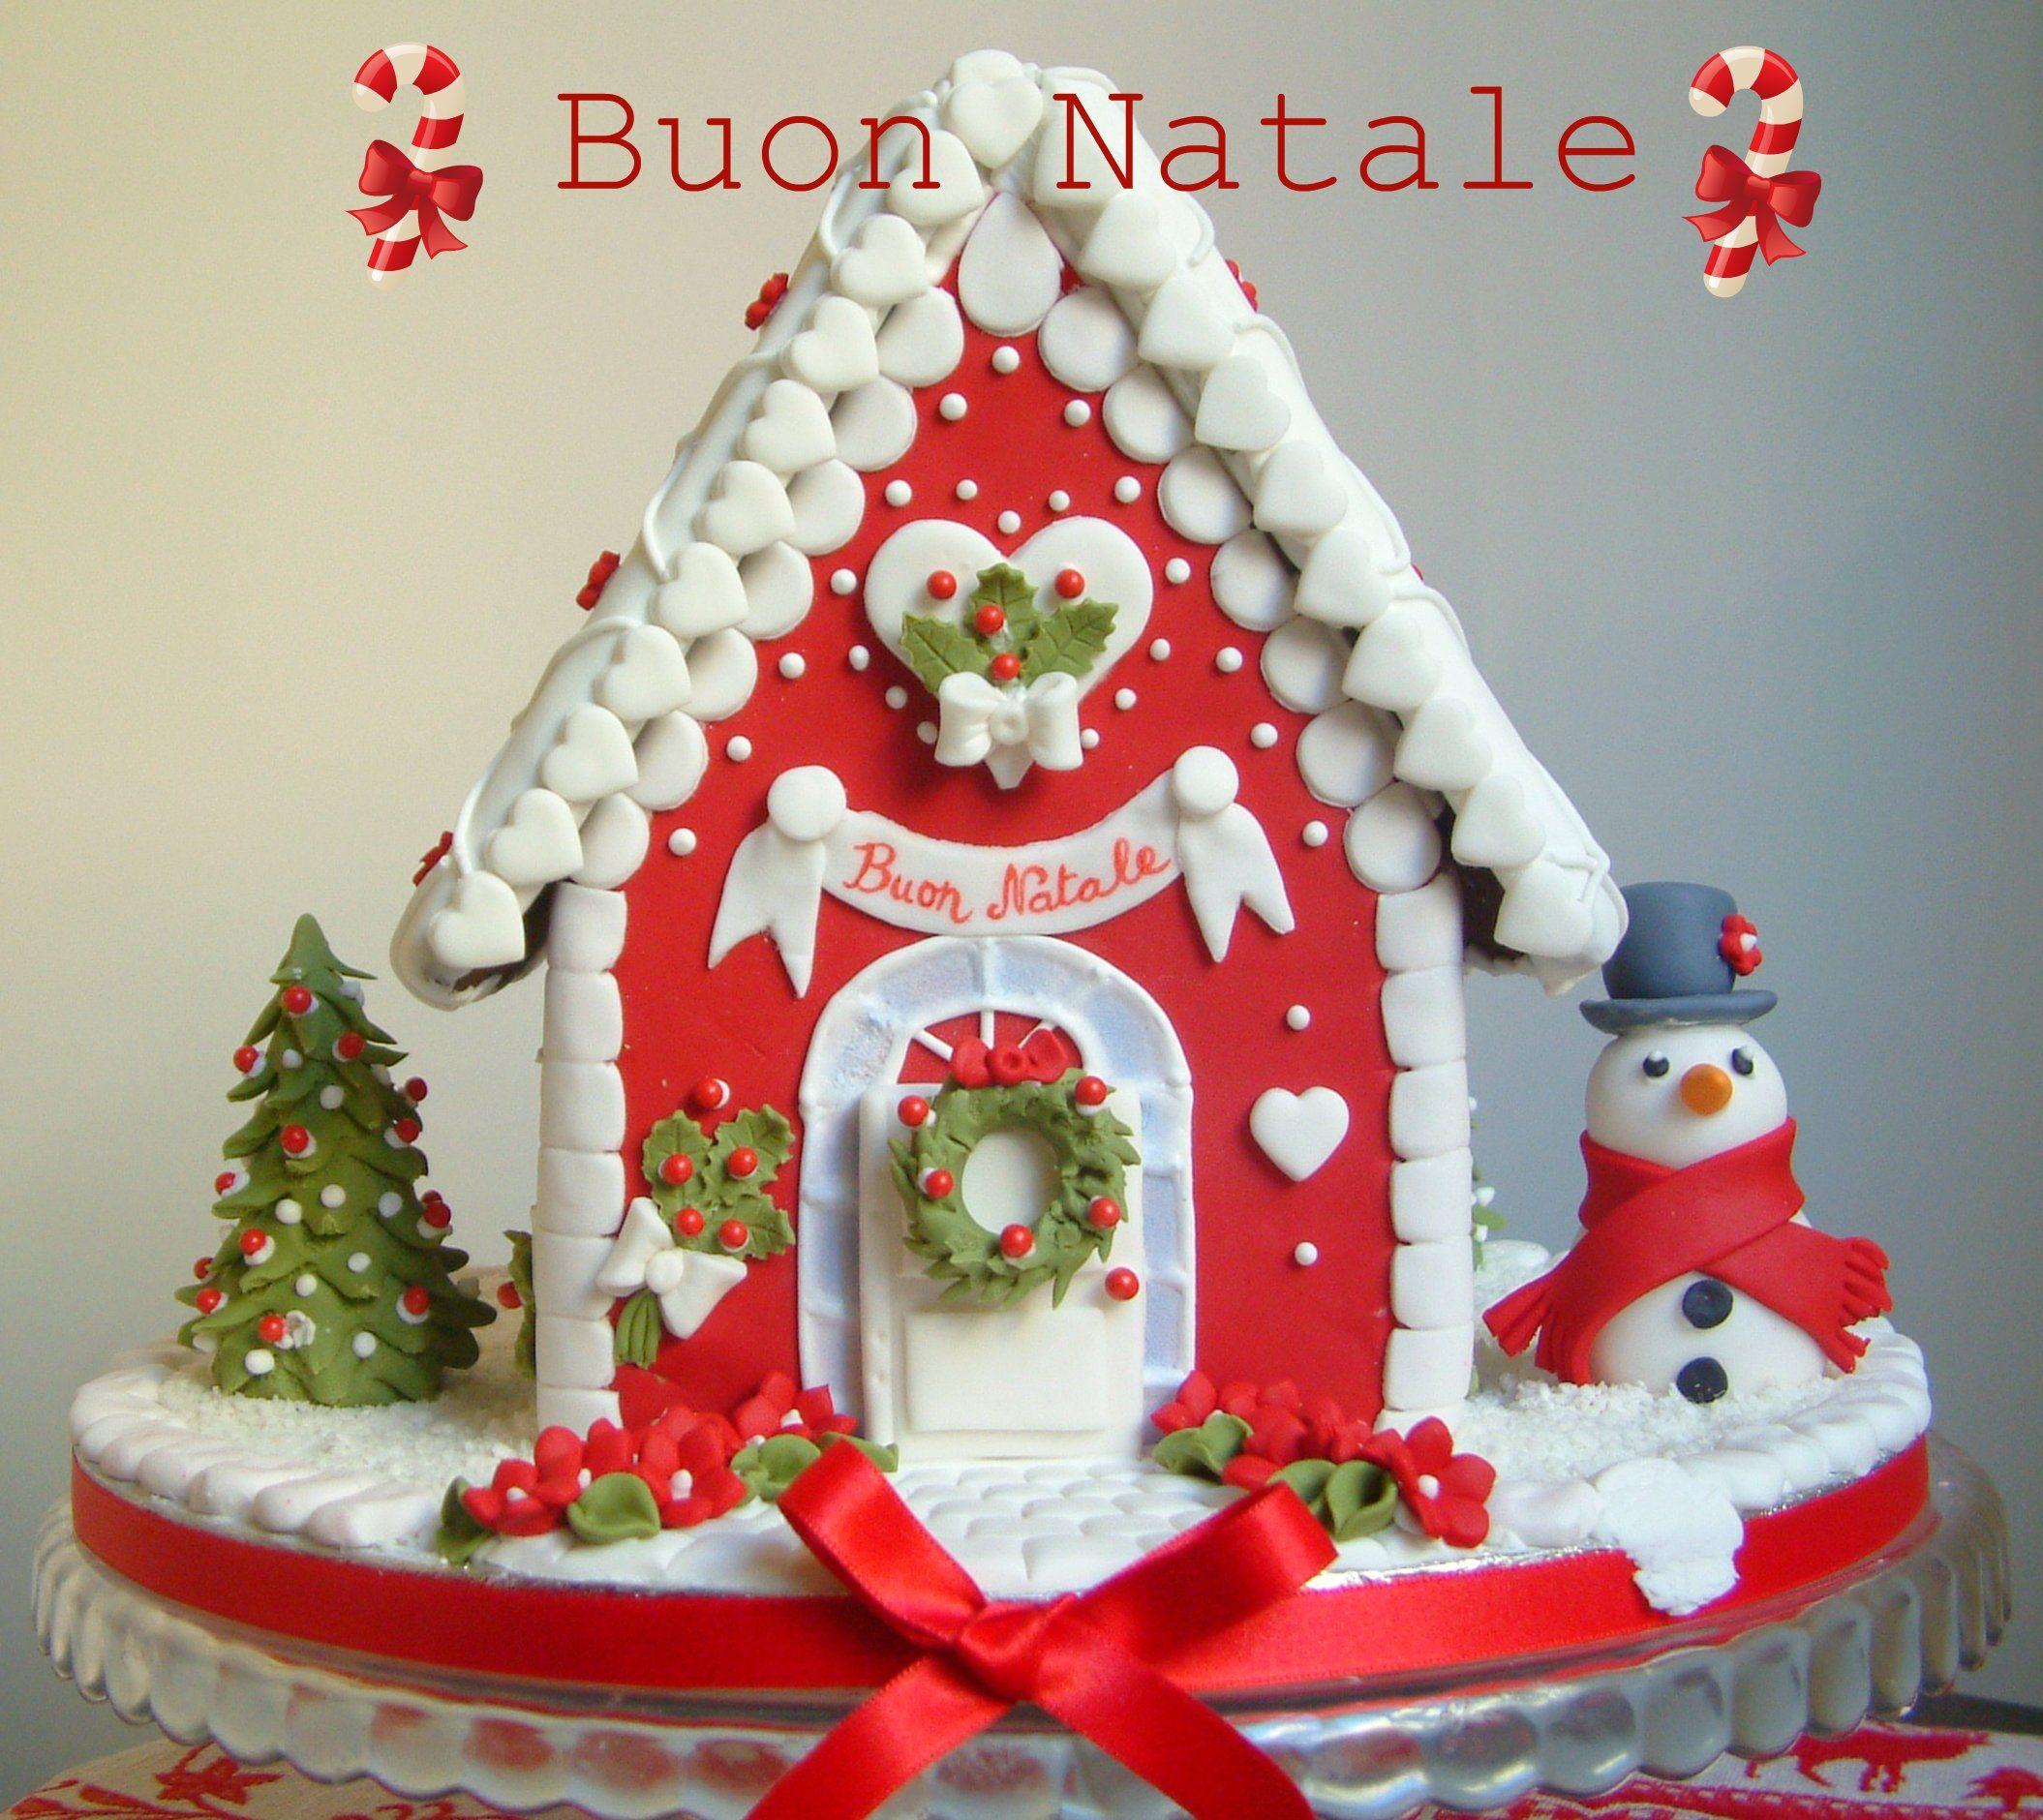 Cake Design House : gingerbread - fondant decorations Gingerbread House Love ...